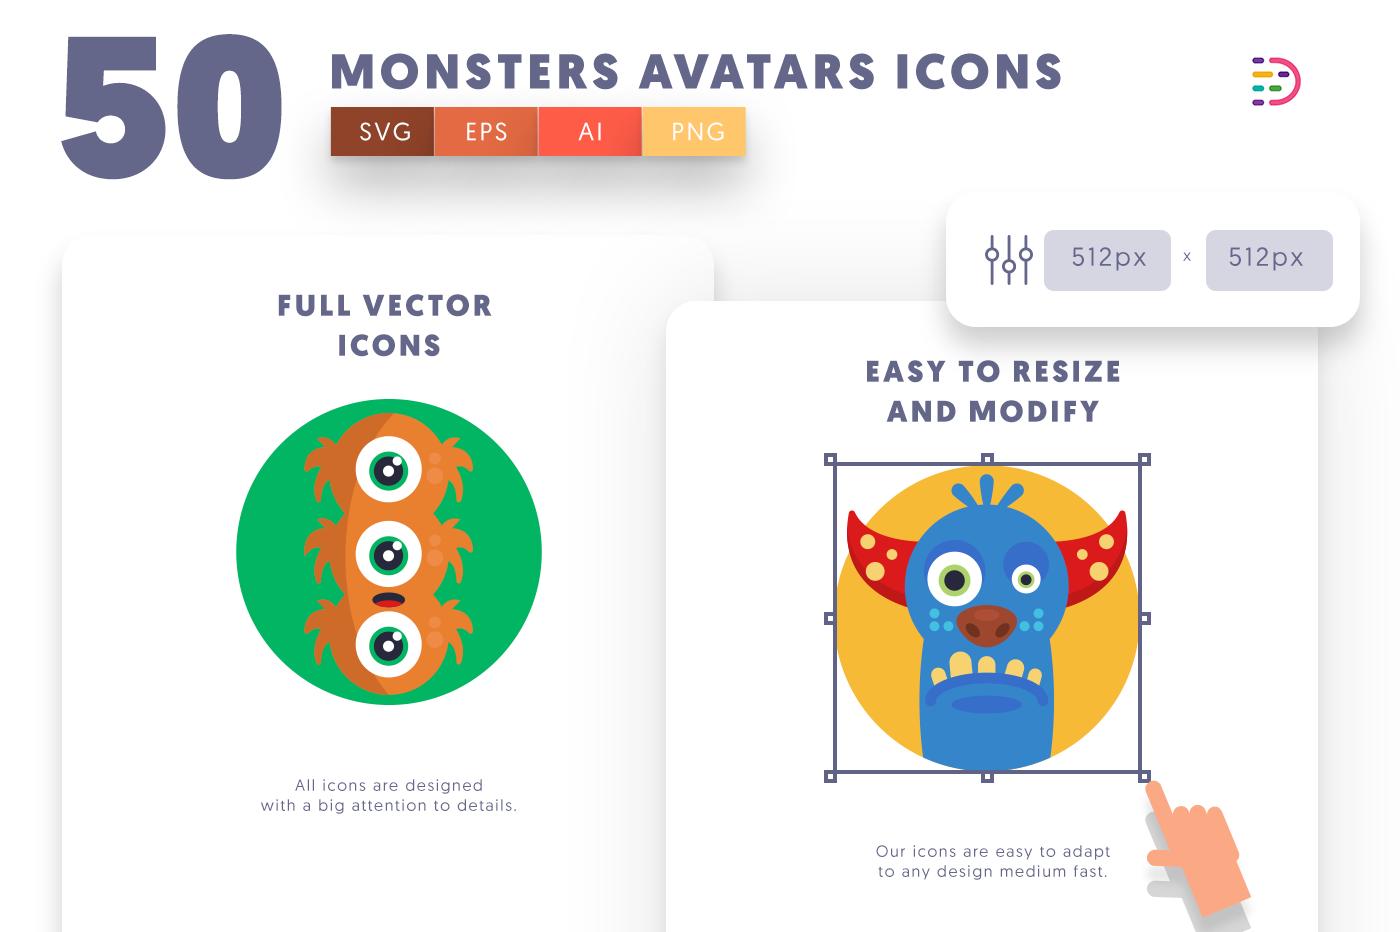 Full vector 50MonstersAvatars Icons